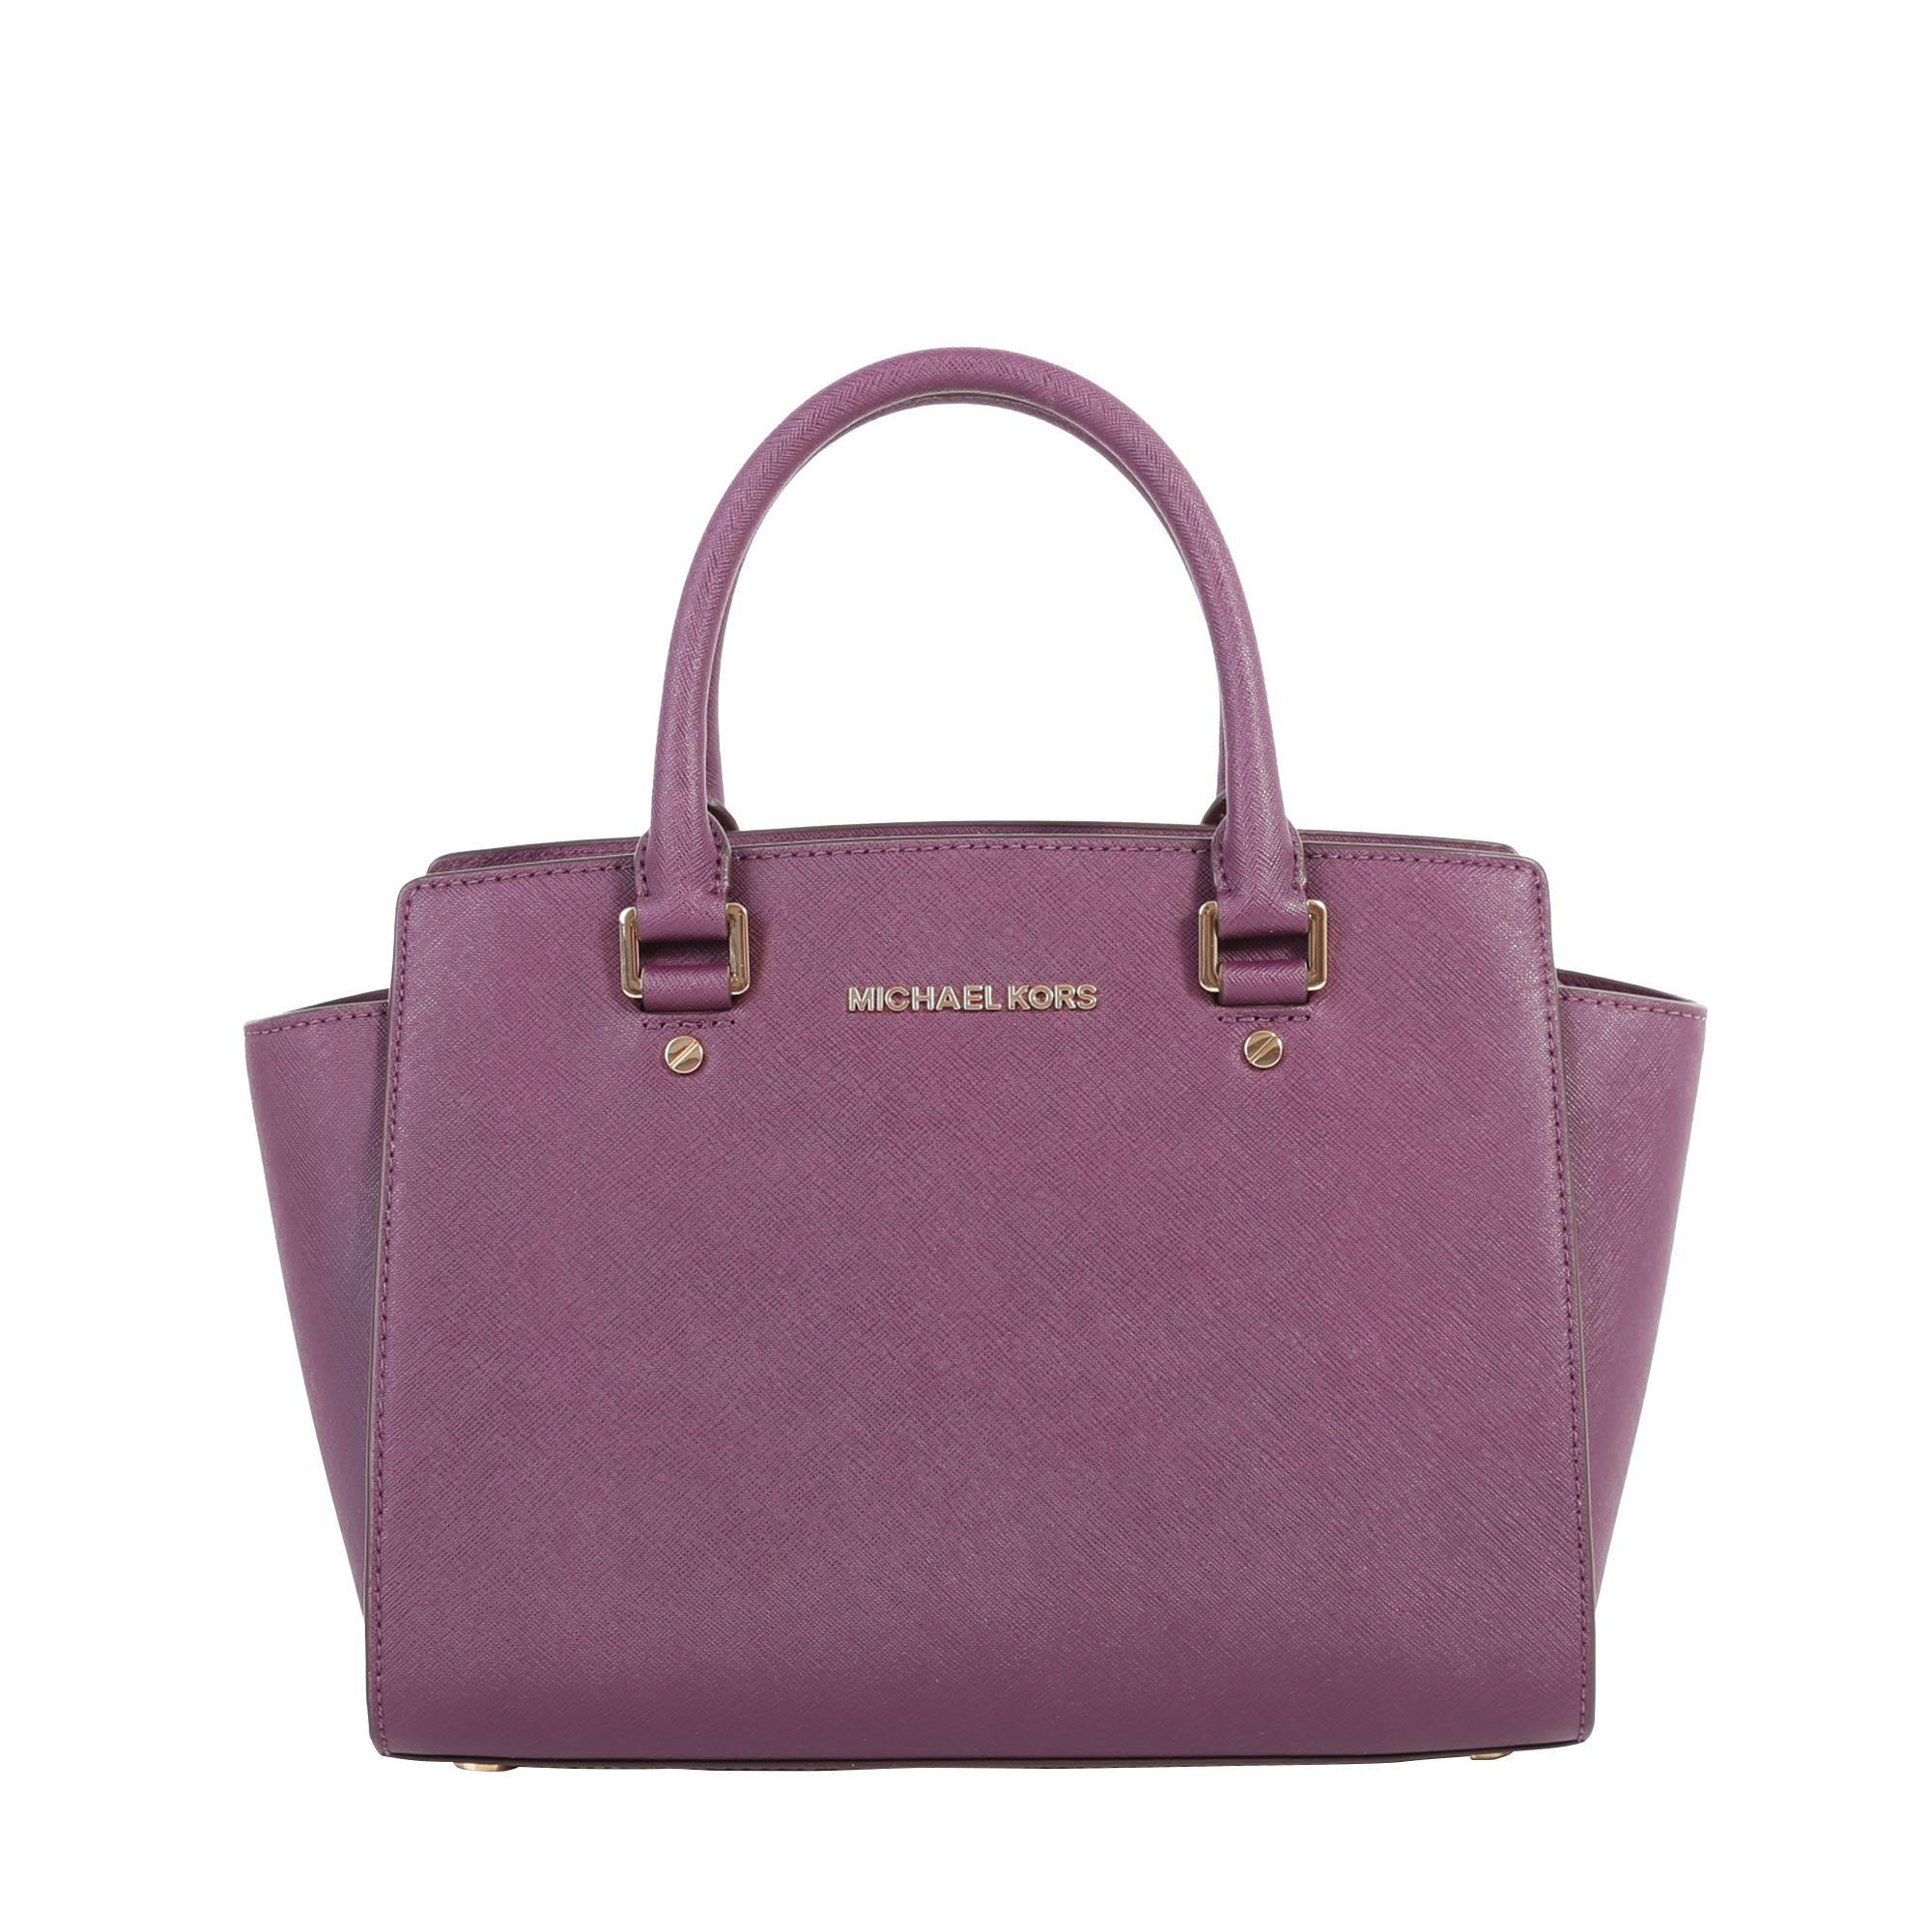 Michael Michael Kors Selma Saffiano Leaher Bag In Purple